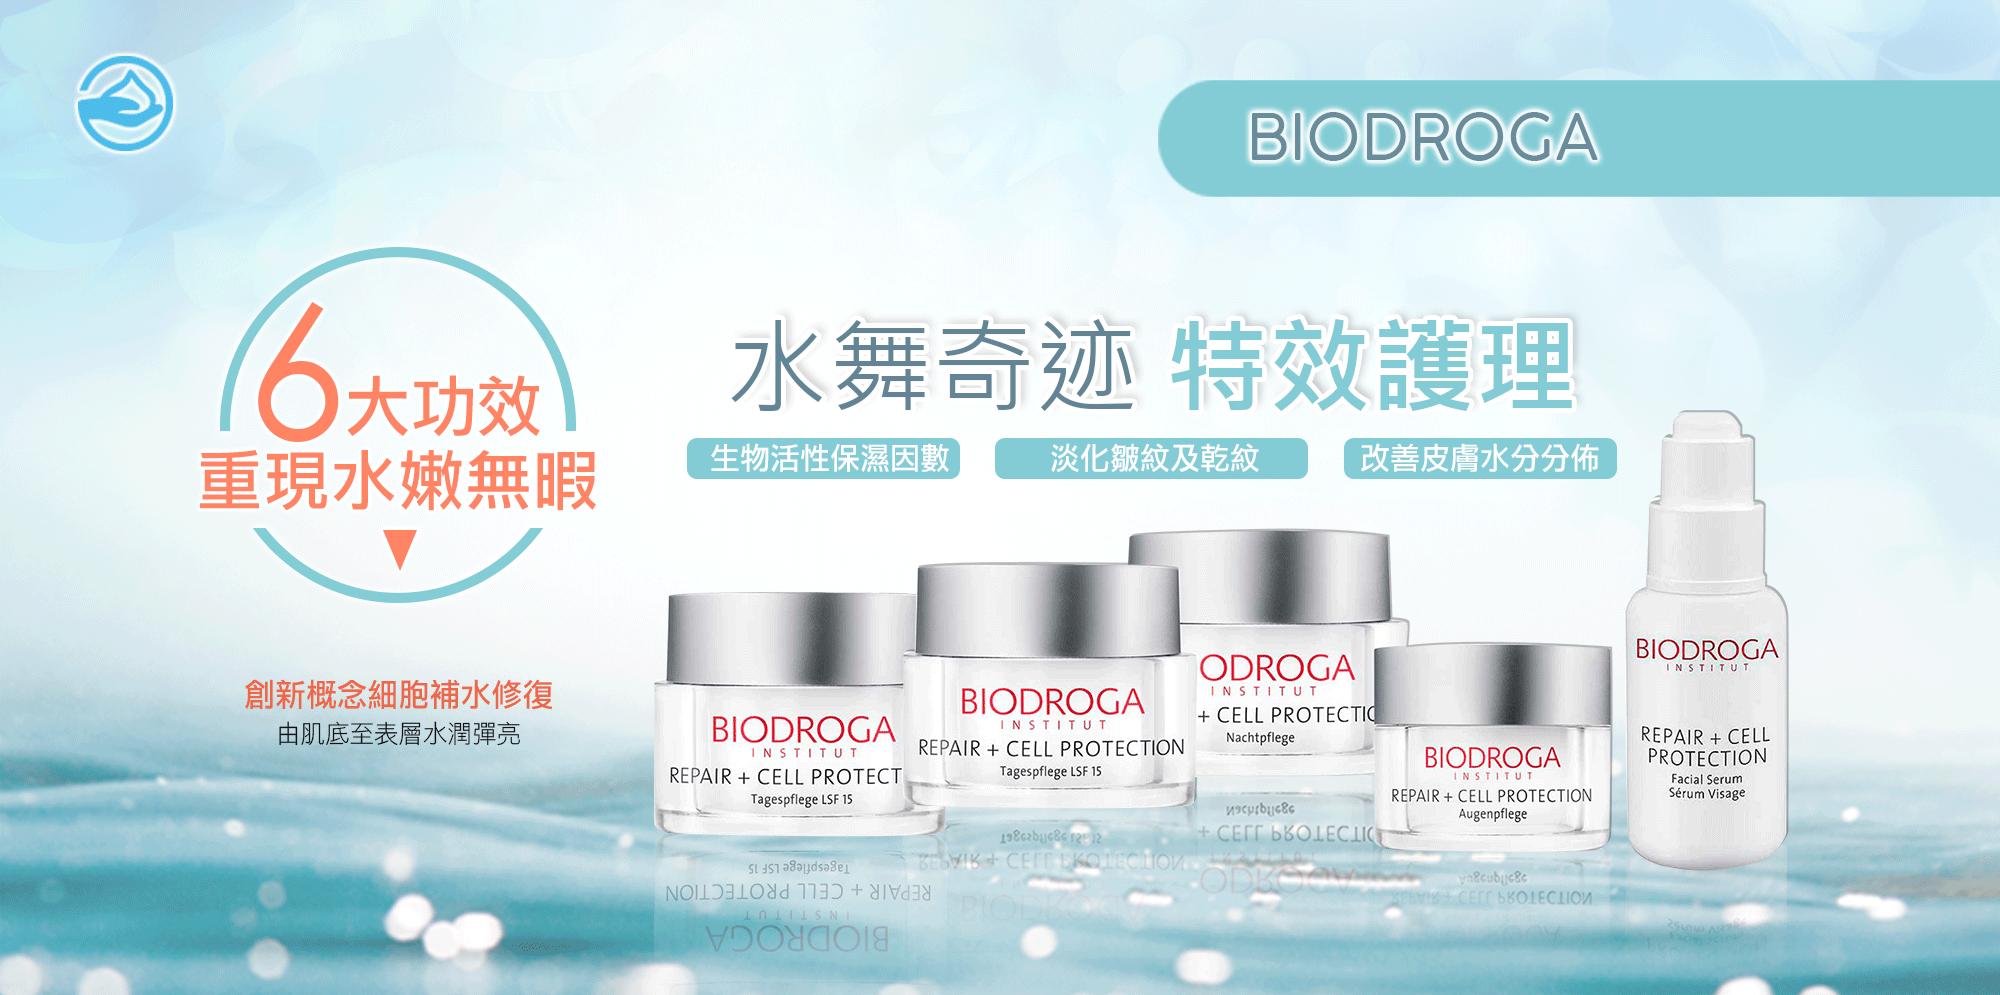 Biodroga水舞奇蹟特效護理 | G2 Beauty Group 時尚美容集團